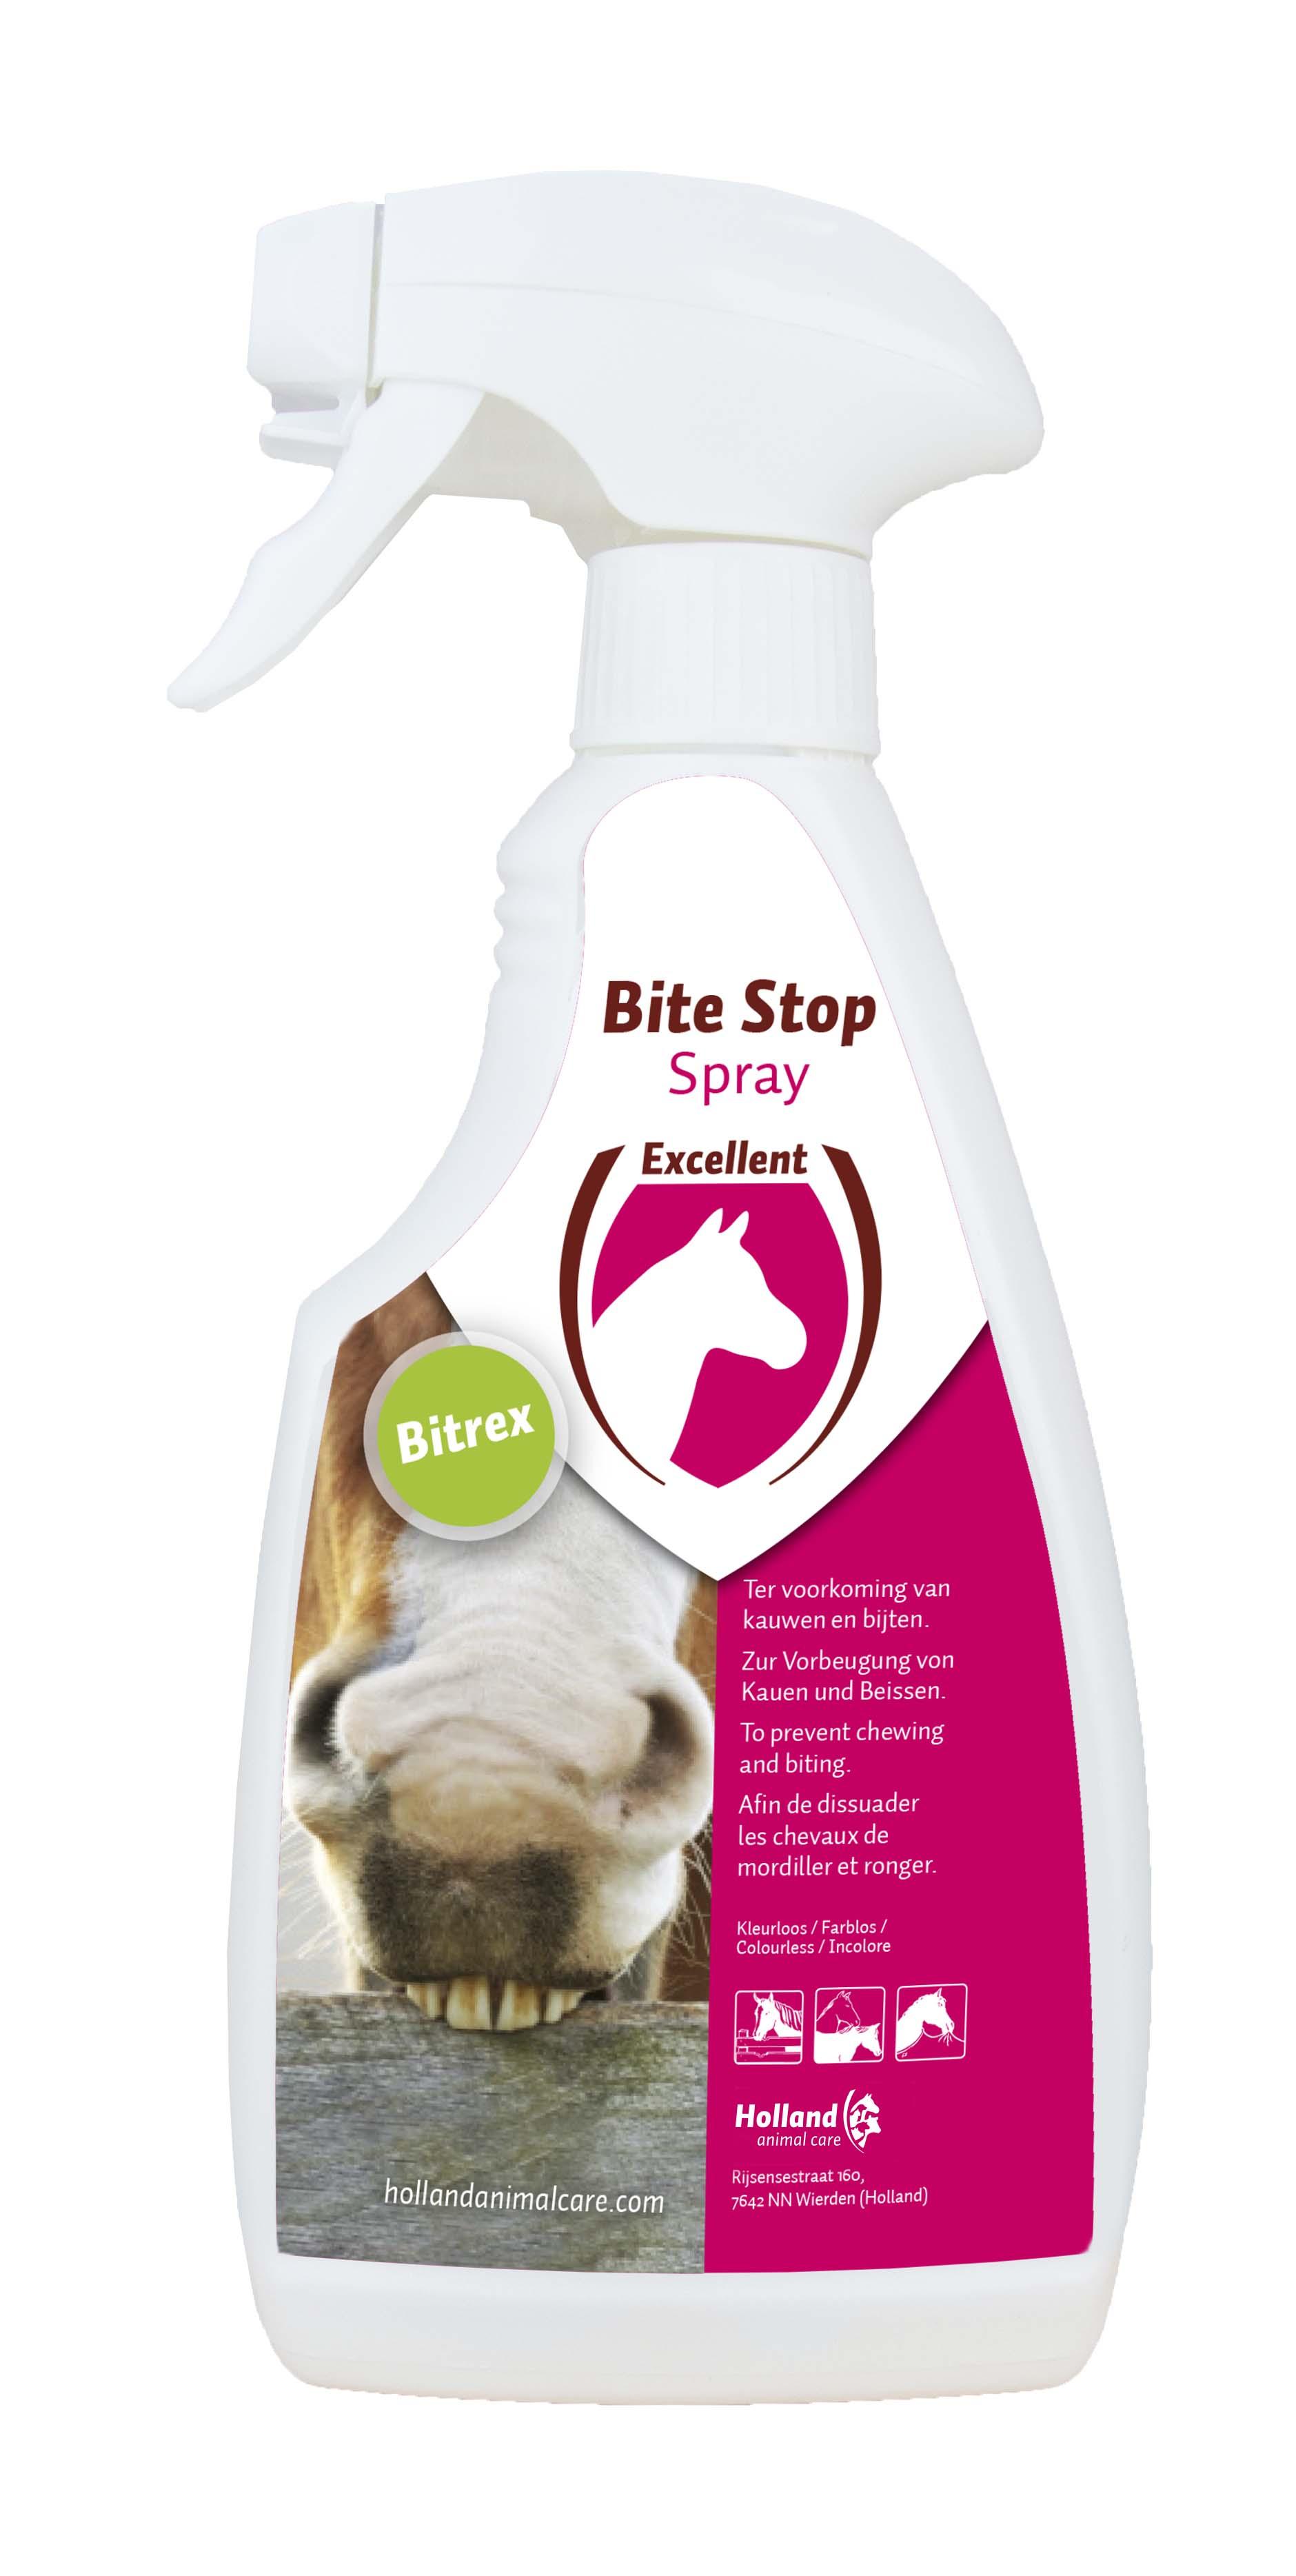 Bite Stop Spray